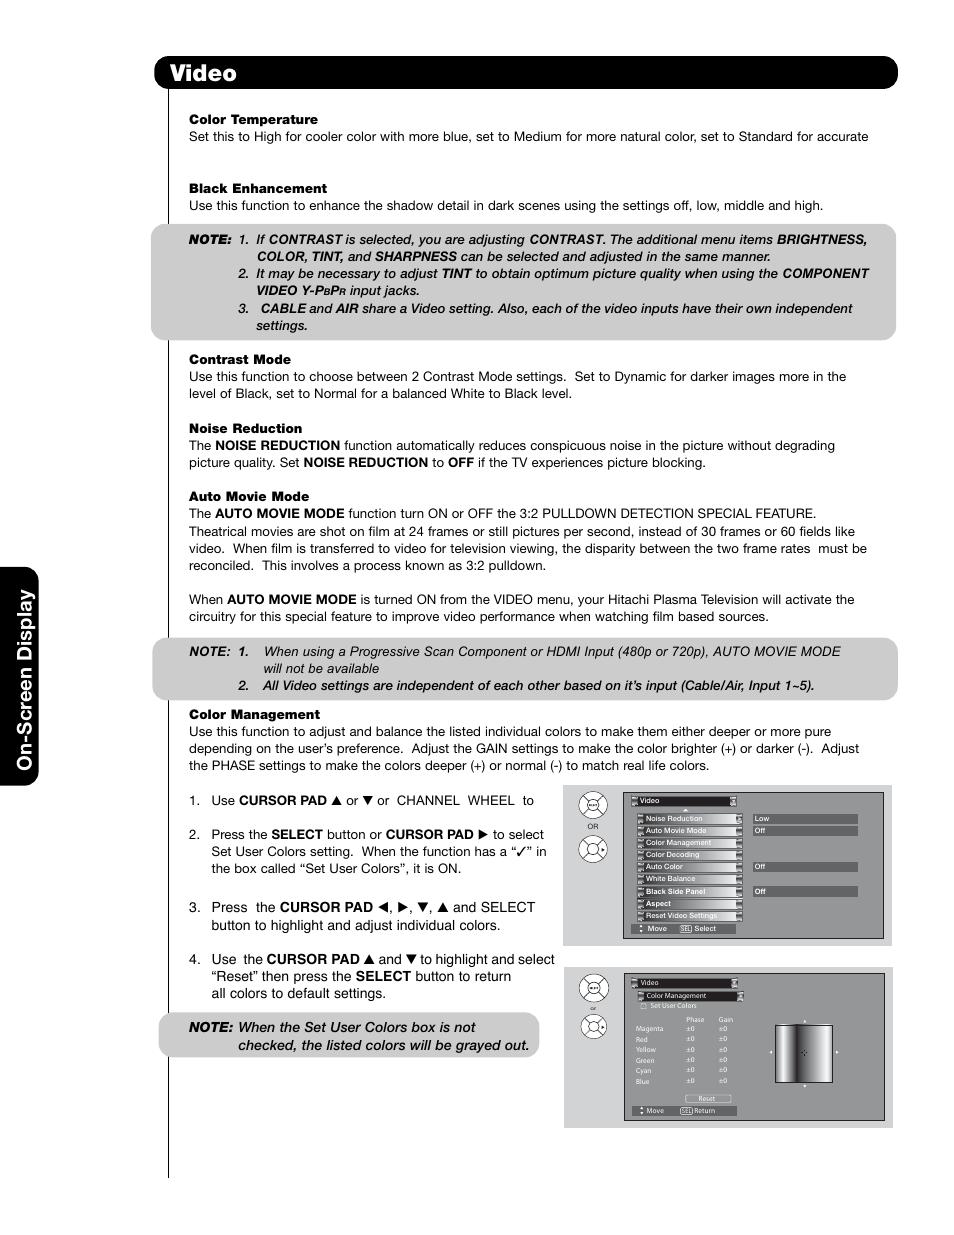 video on scr een display hitachi 55hdt79 user manual page 48 rh manualsdir com Hitachi Plasma HDTV Hitachi 50VS69A TV Model